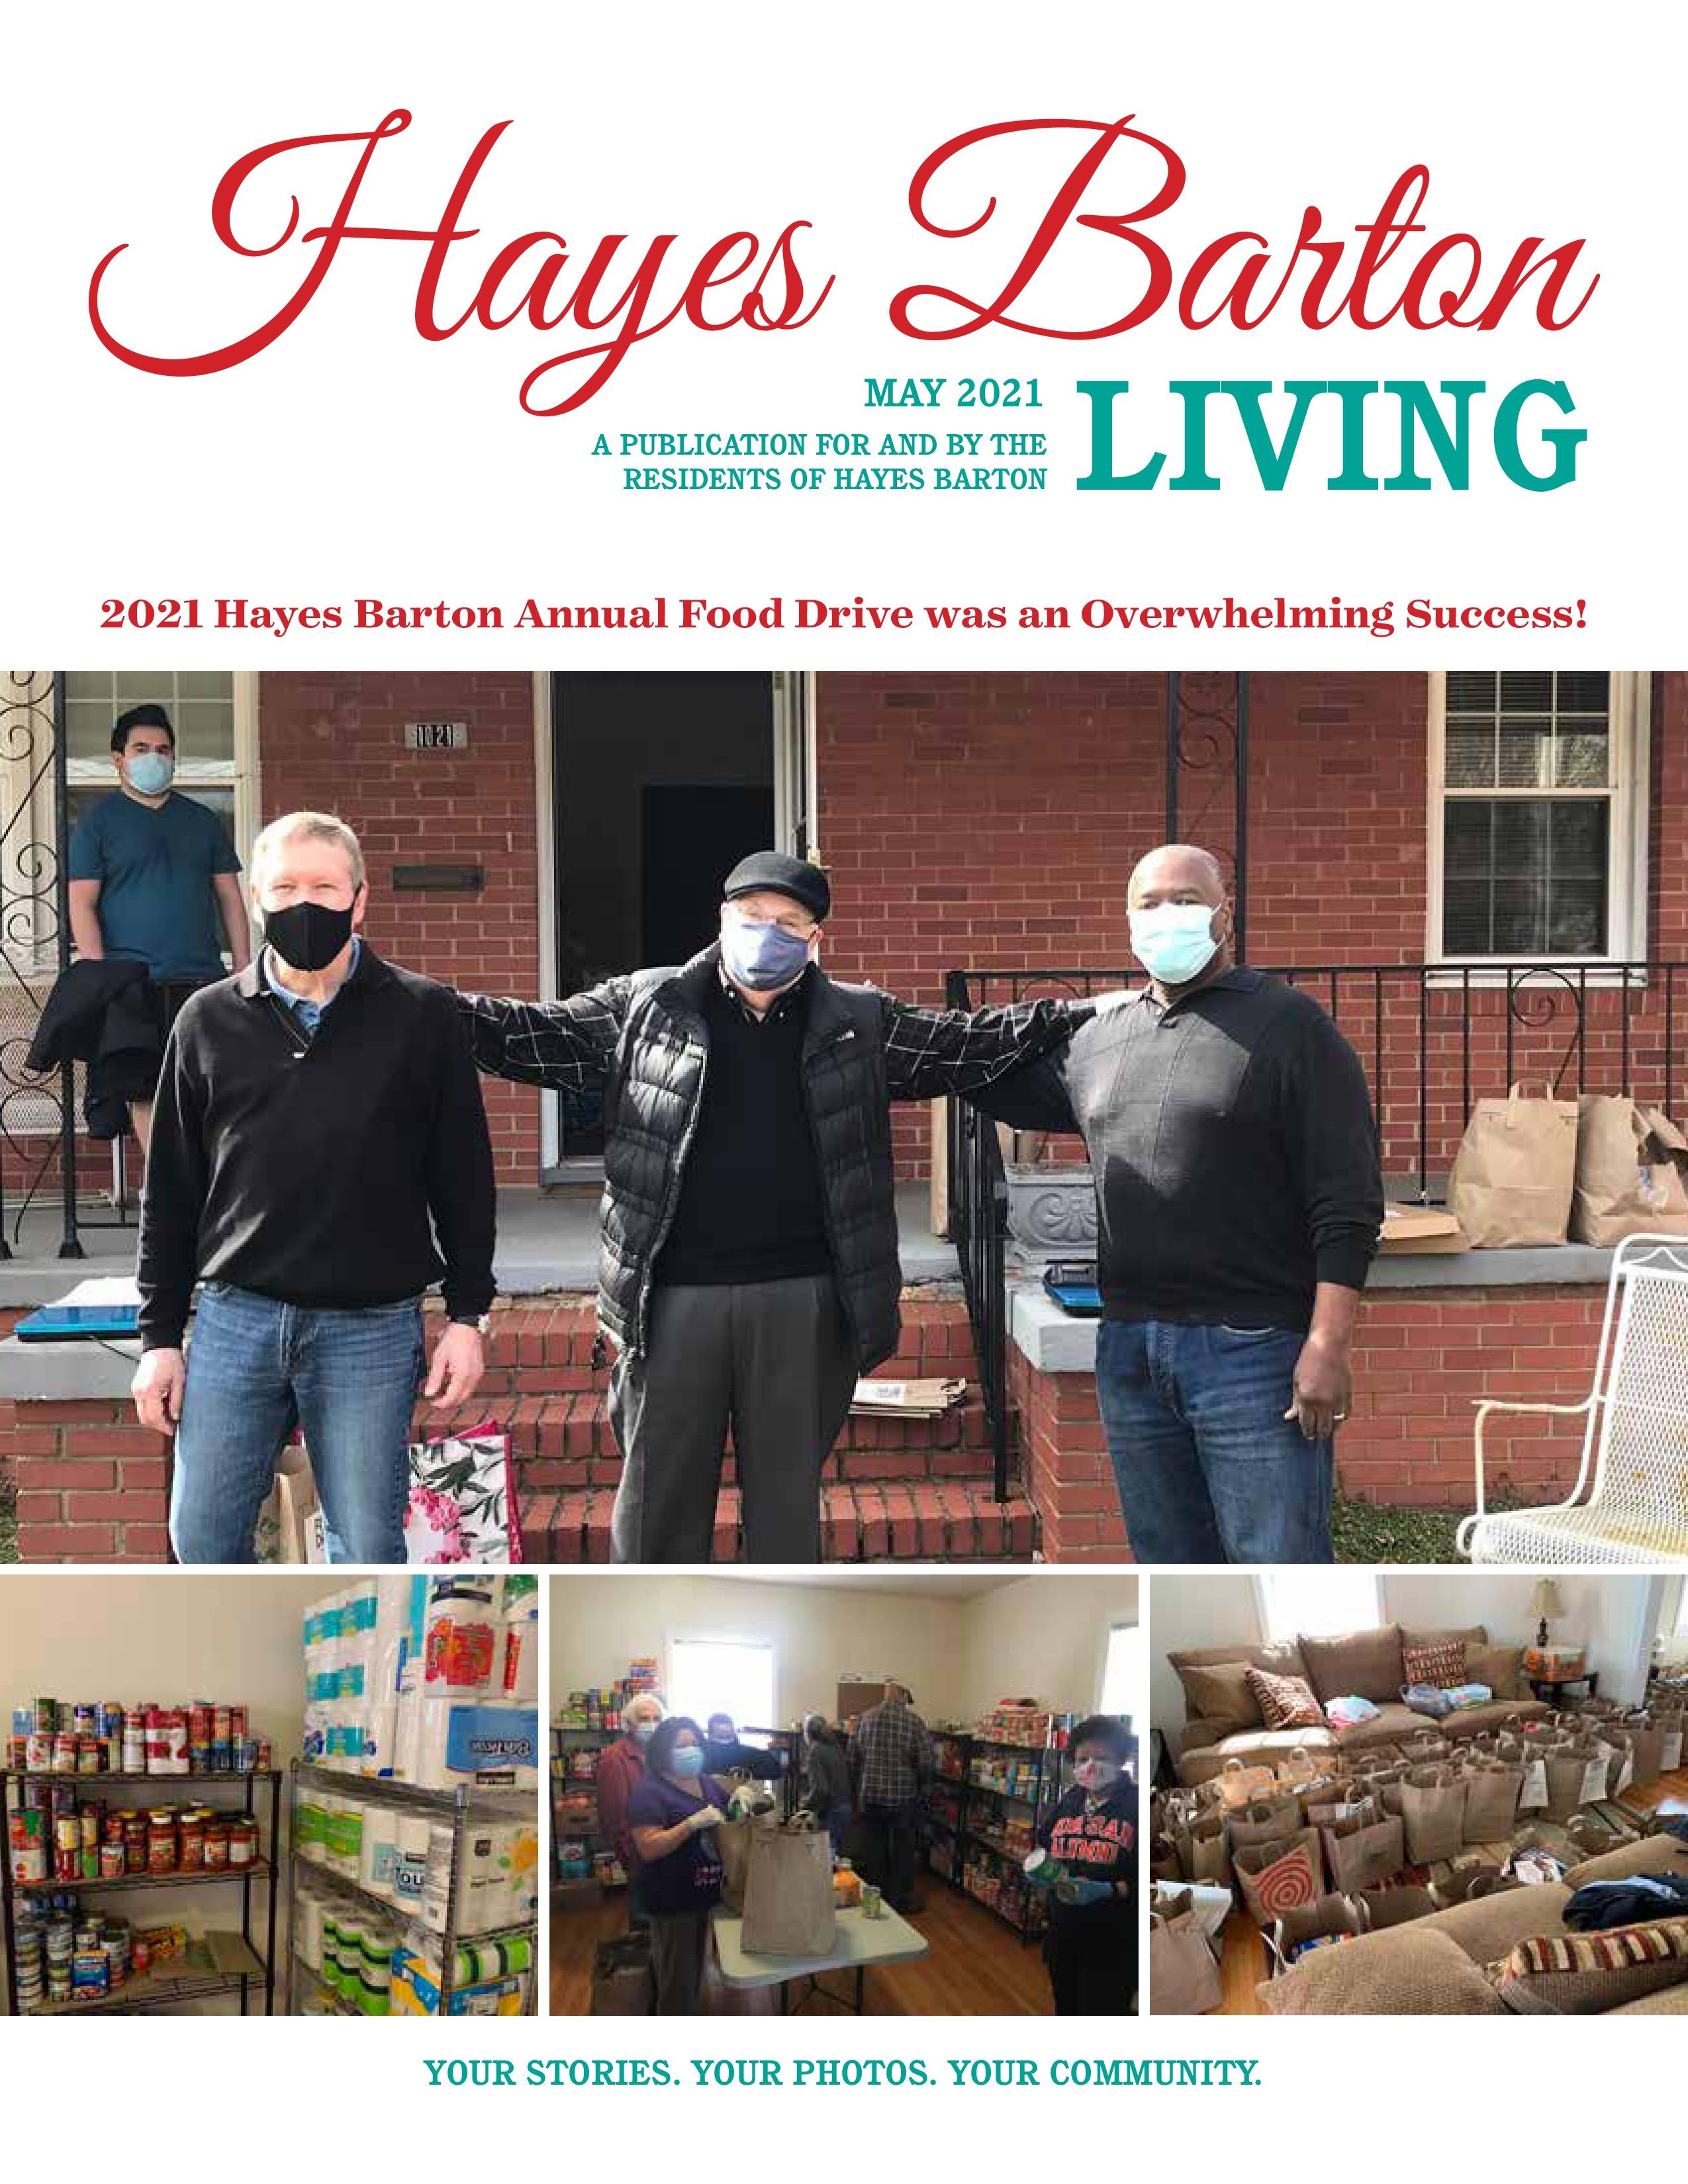 Hayes Barton Living 2021-05-01